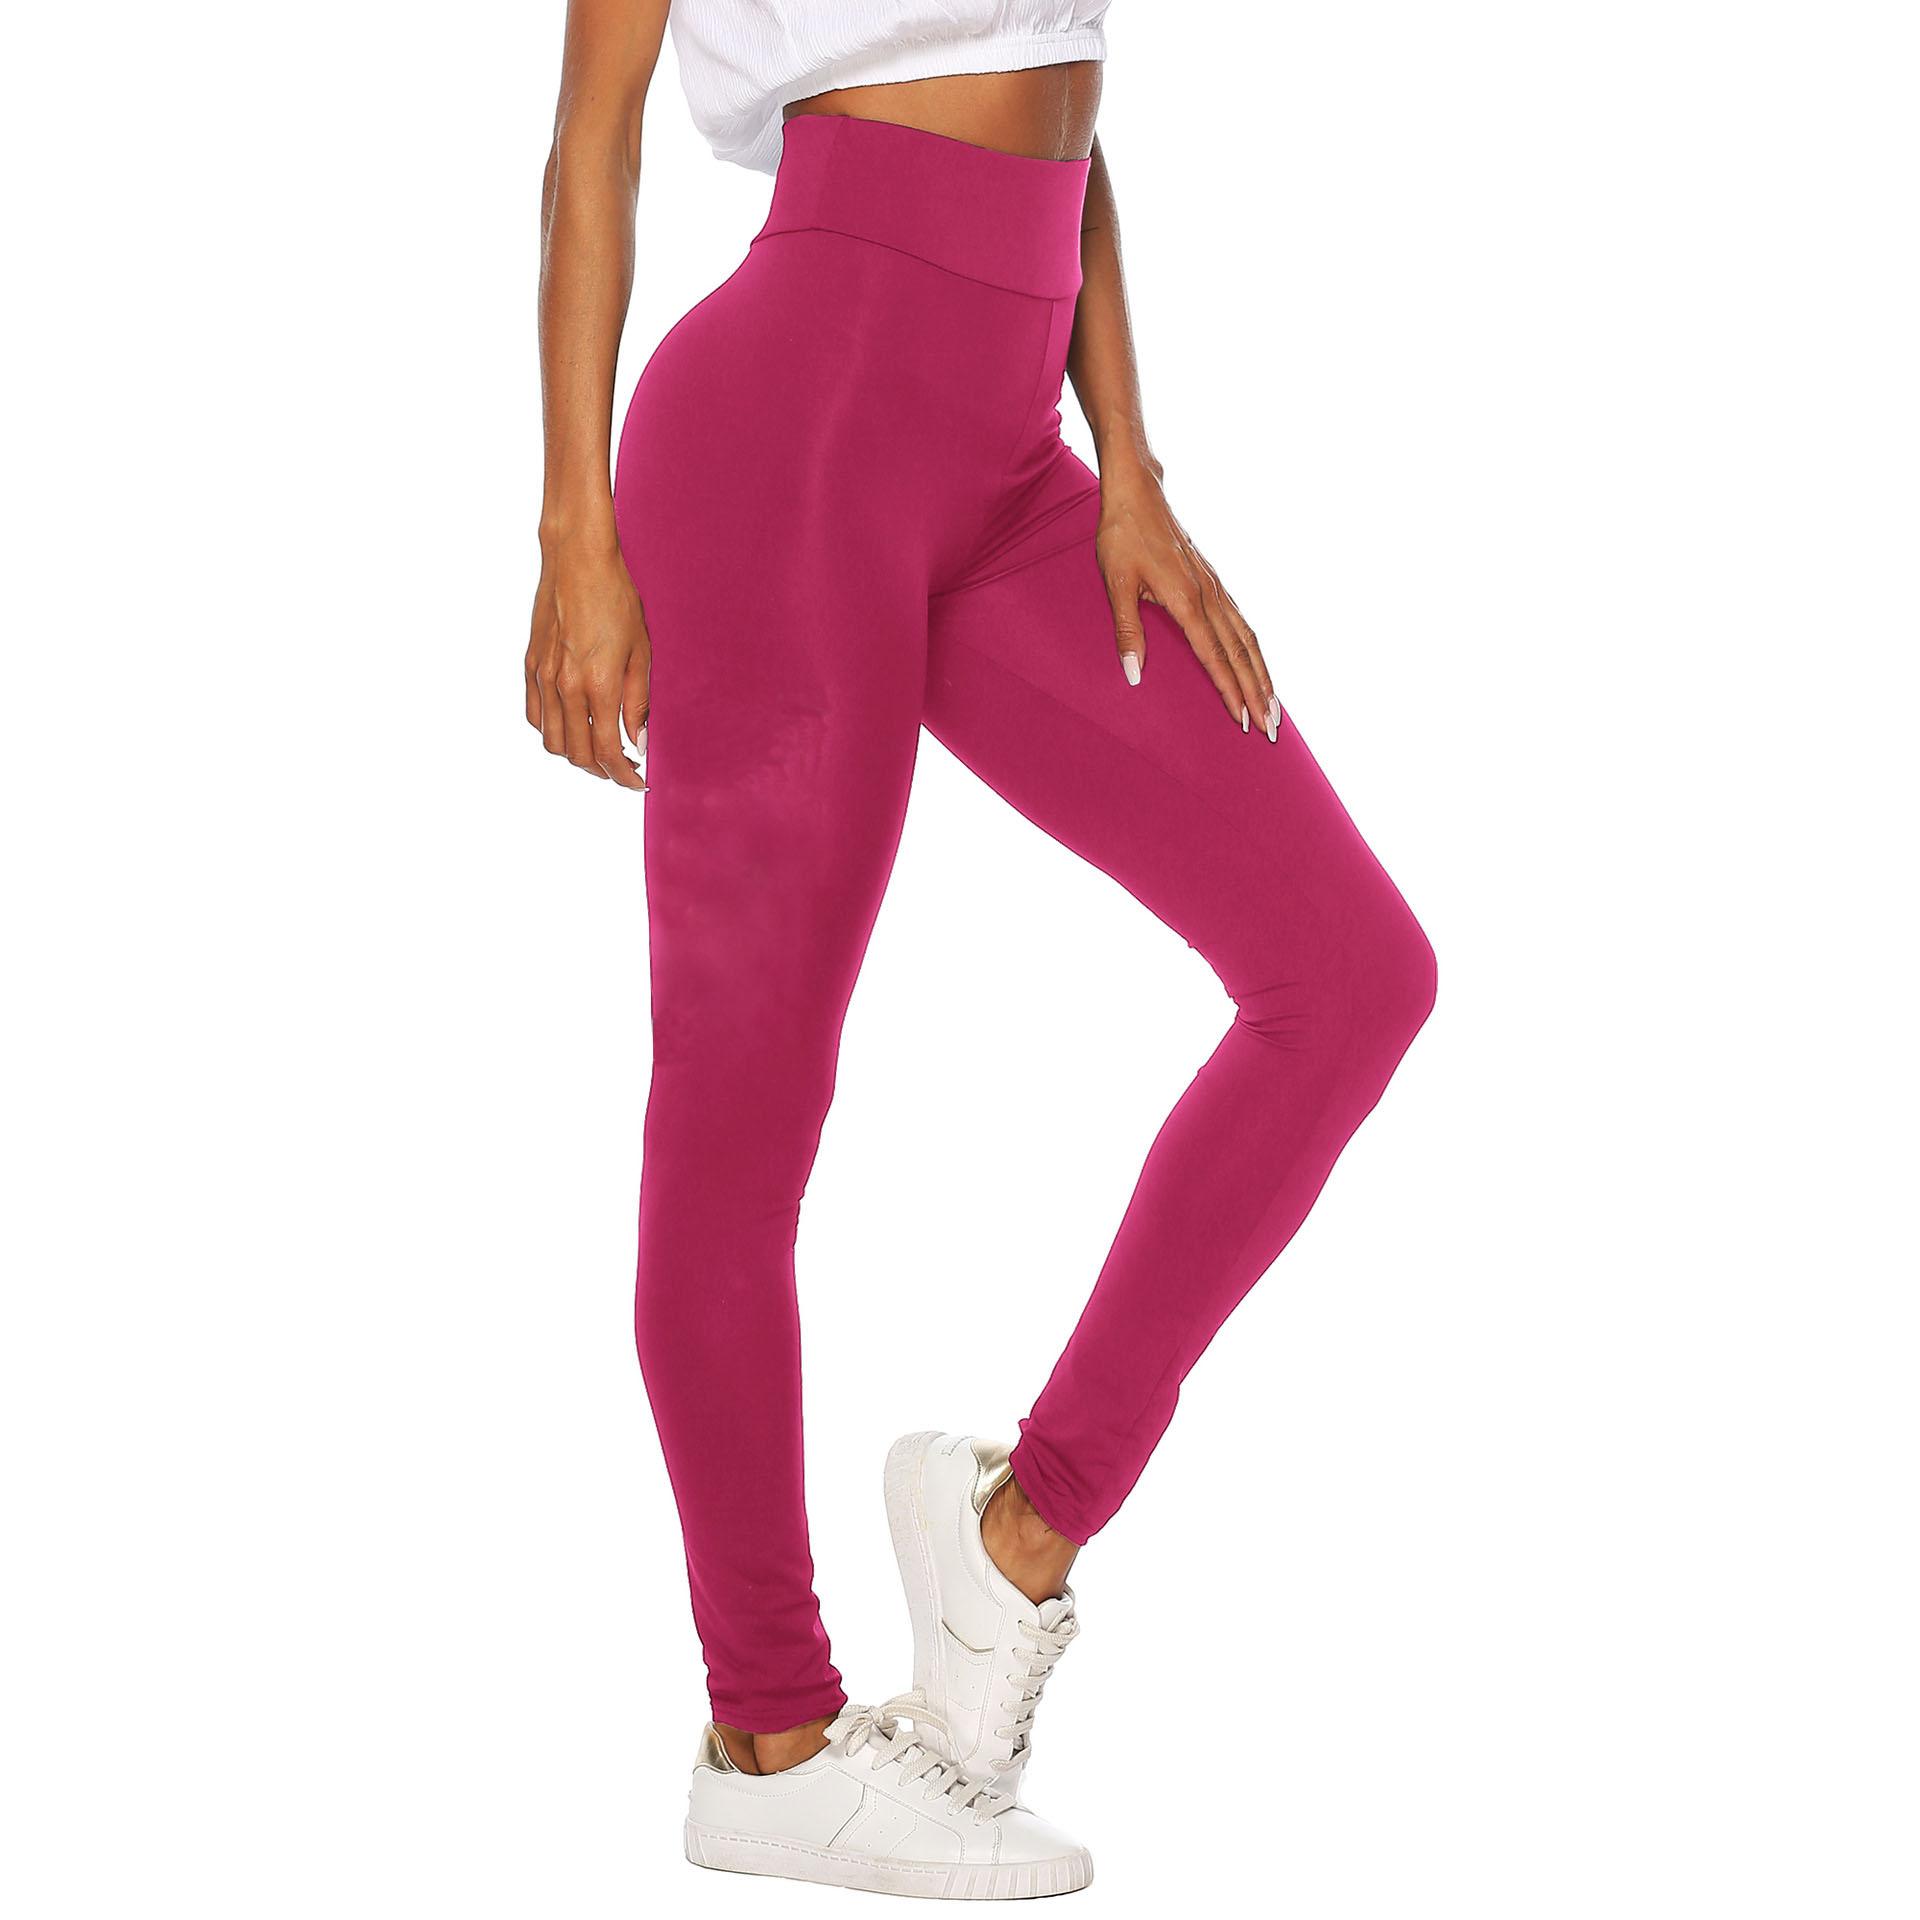 Workout Legging for Women Tummy Control Yoga Leggings 4 Way Stretch FIGESTIN High Waist Yoga Pants with Side Pockets